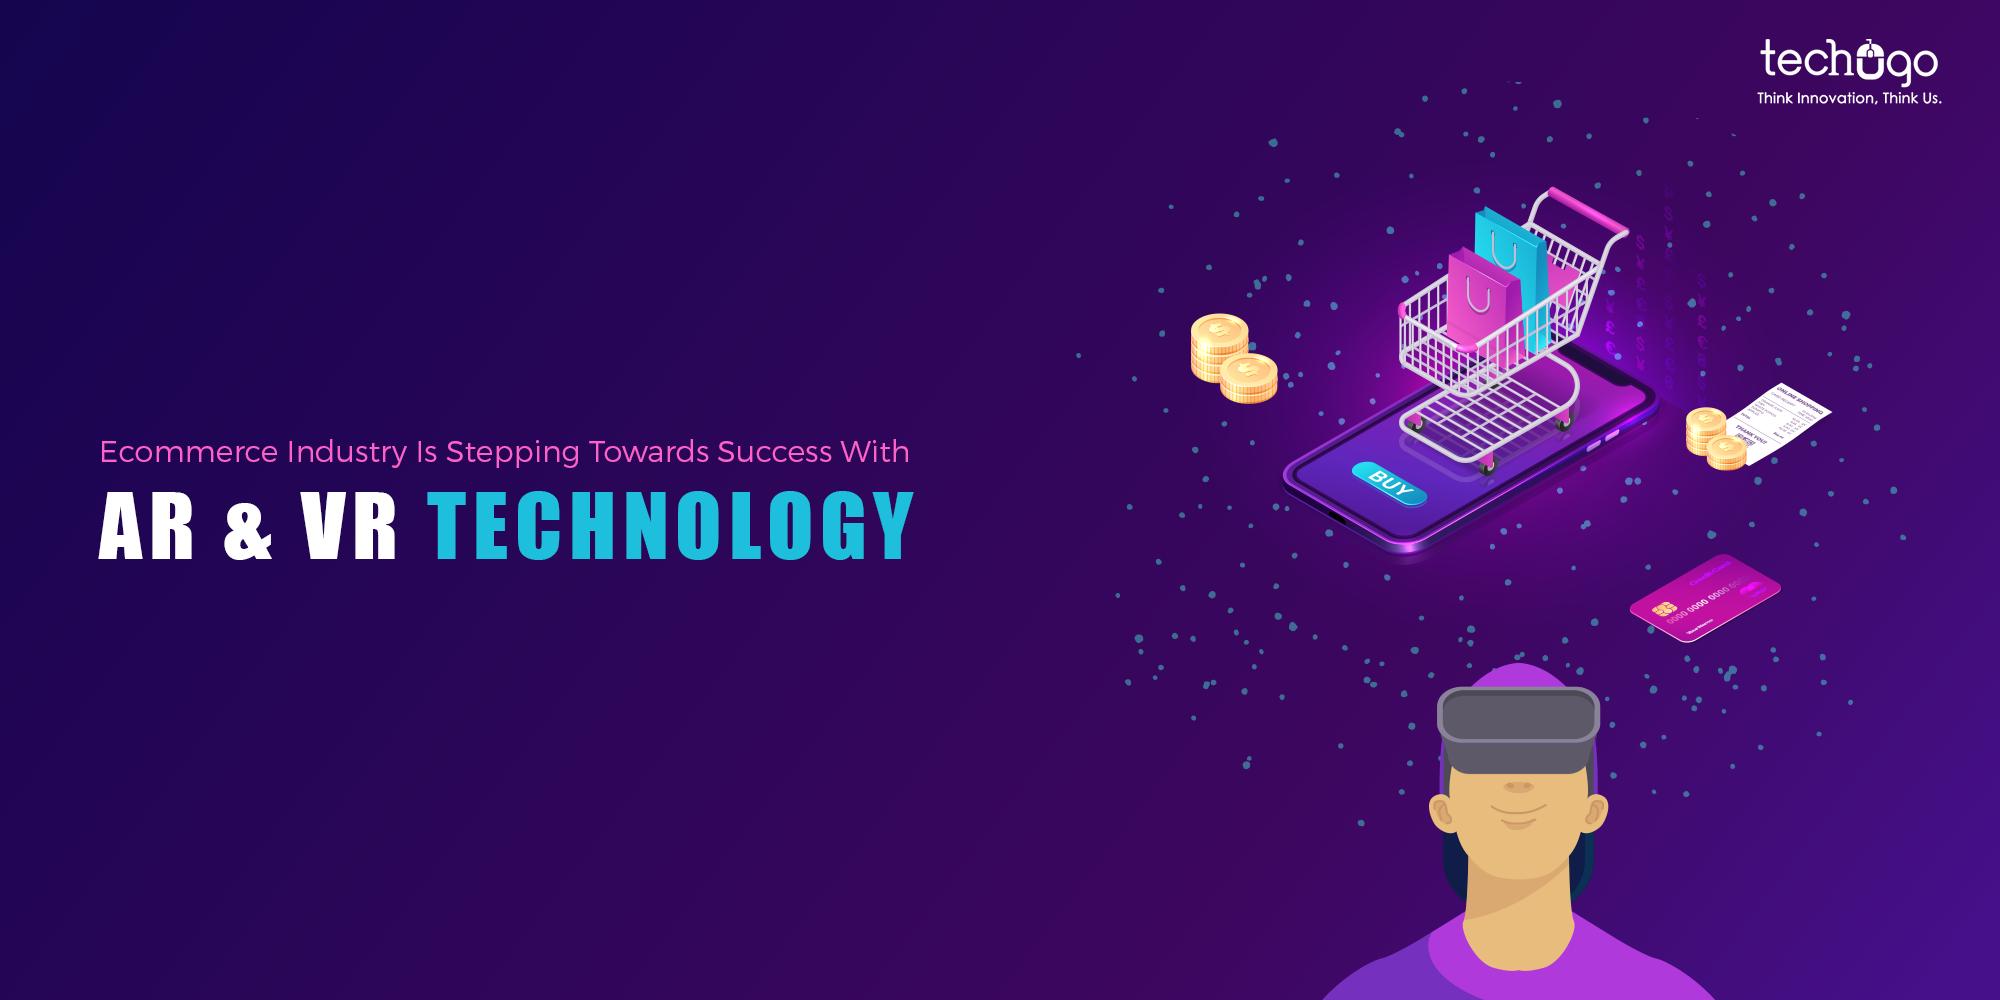 AR & VR Technology